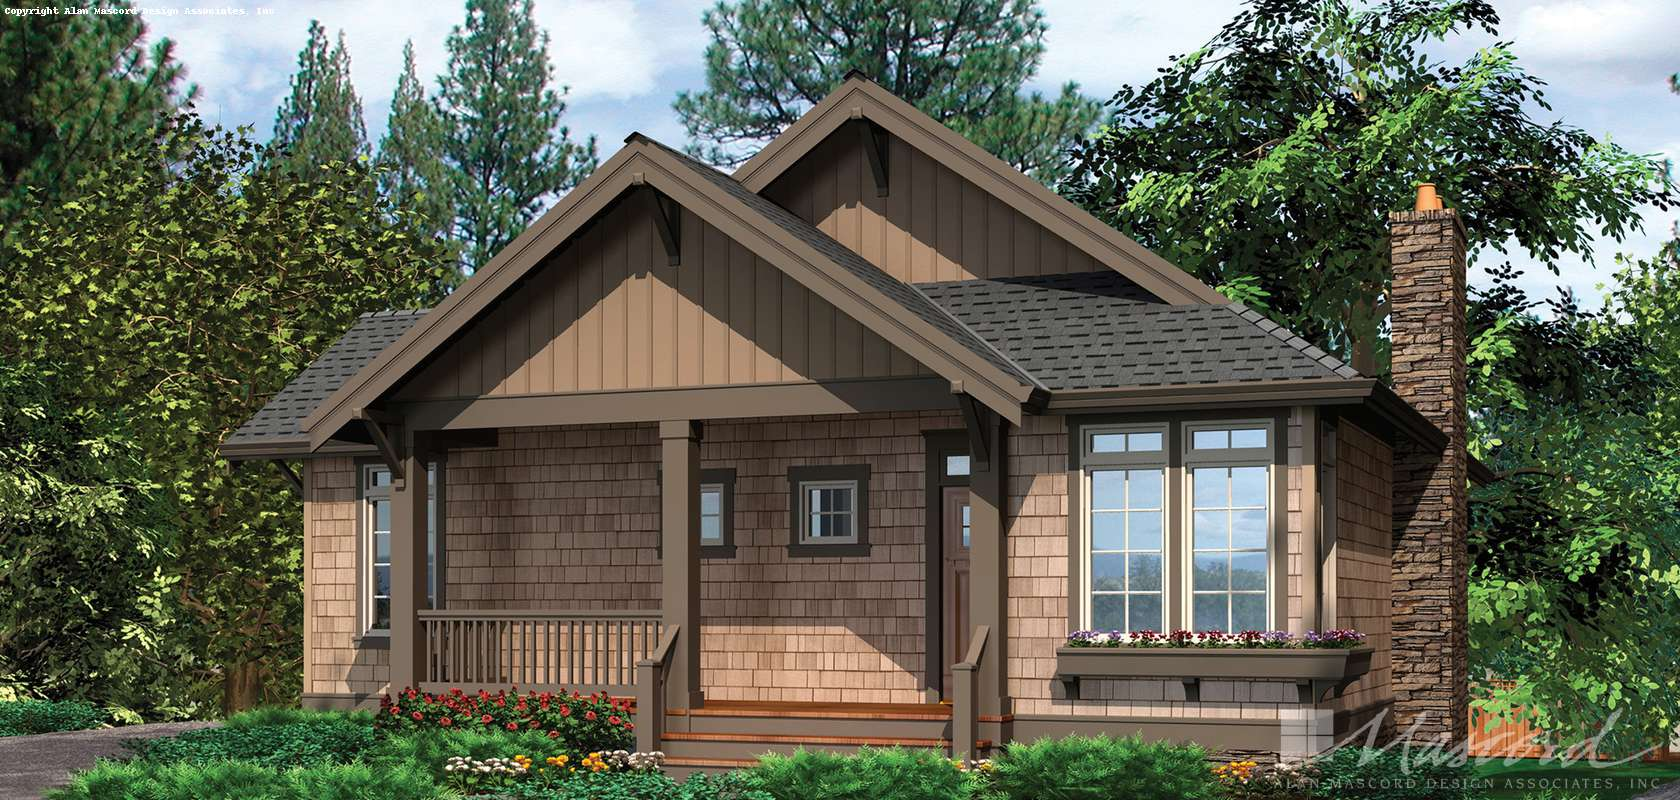 Mascord House Plan 1158: The Abery